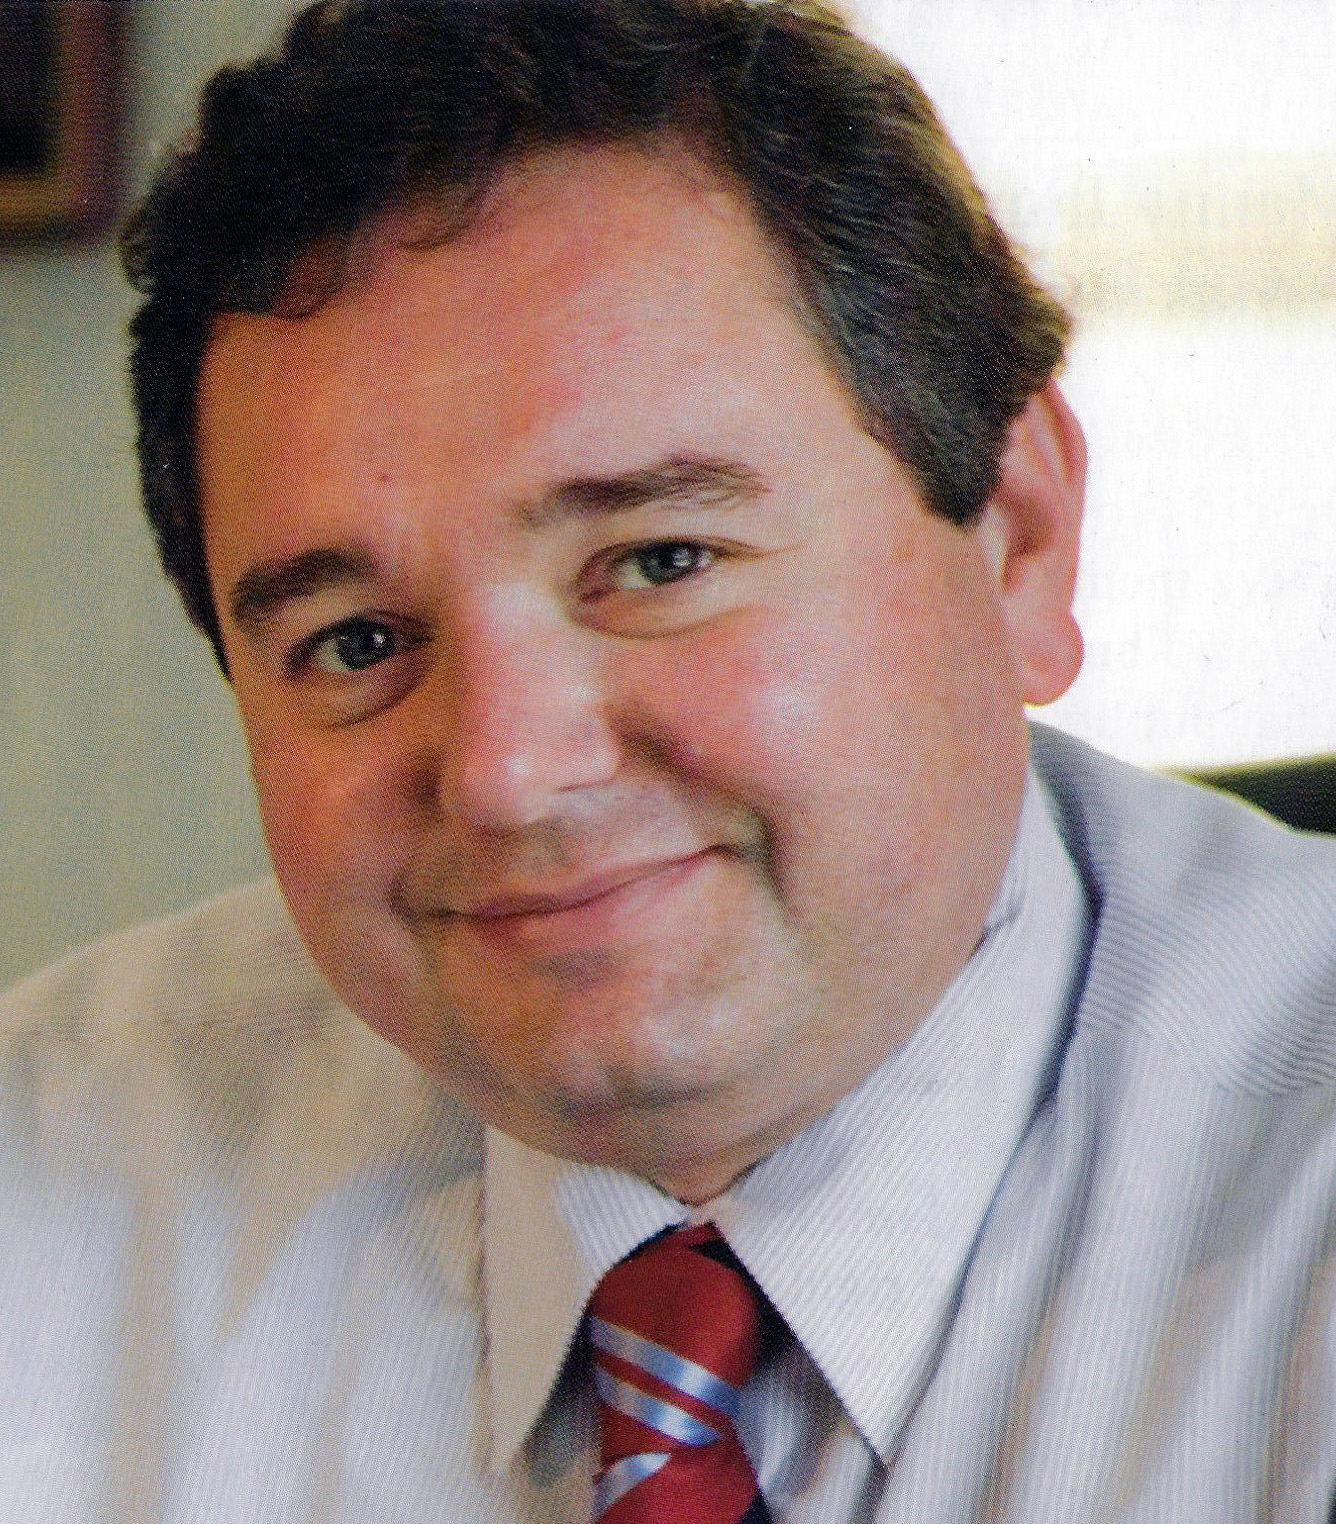 Manny Innamorato